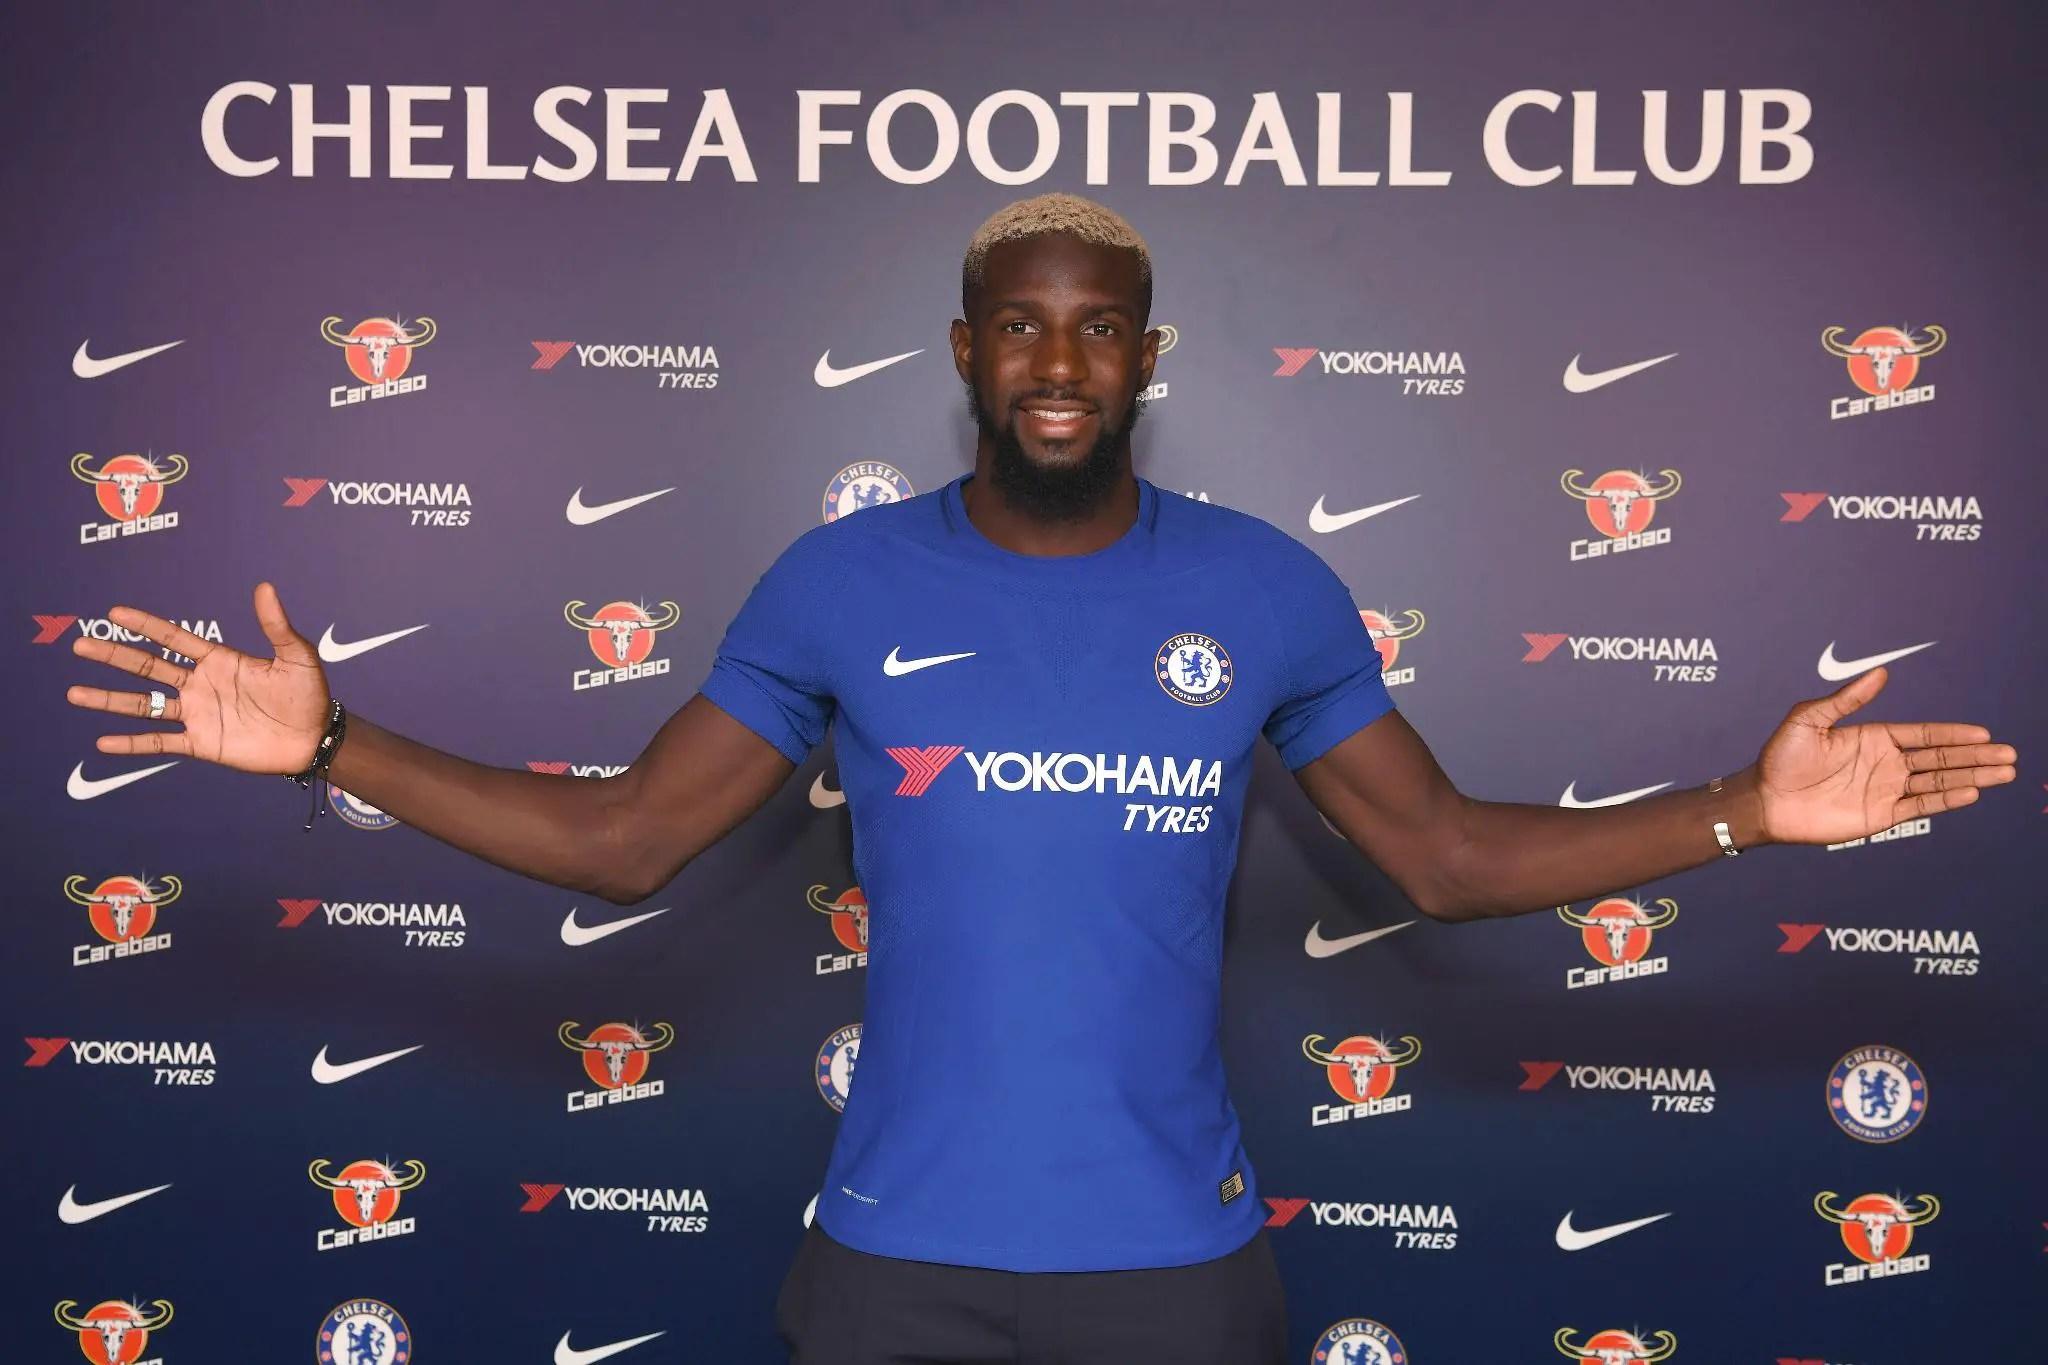 Bakayoko: I'll Form Beautiful Partnership With Kante At Chelsea